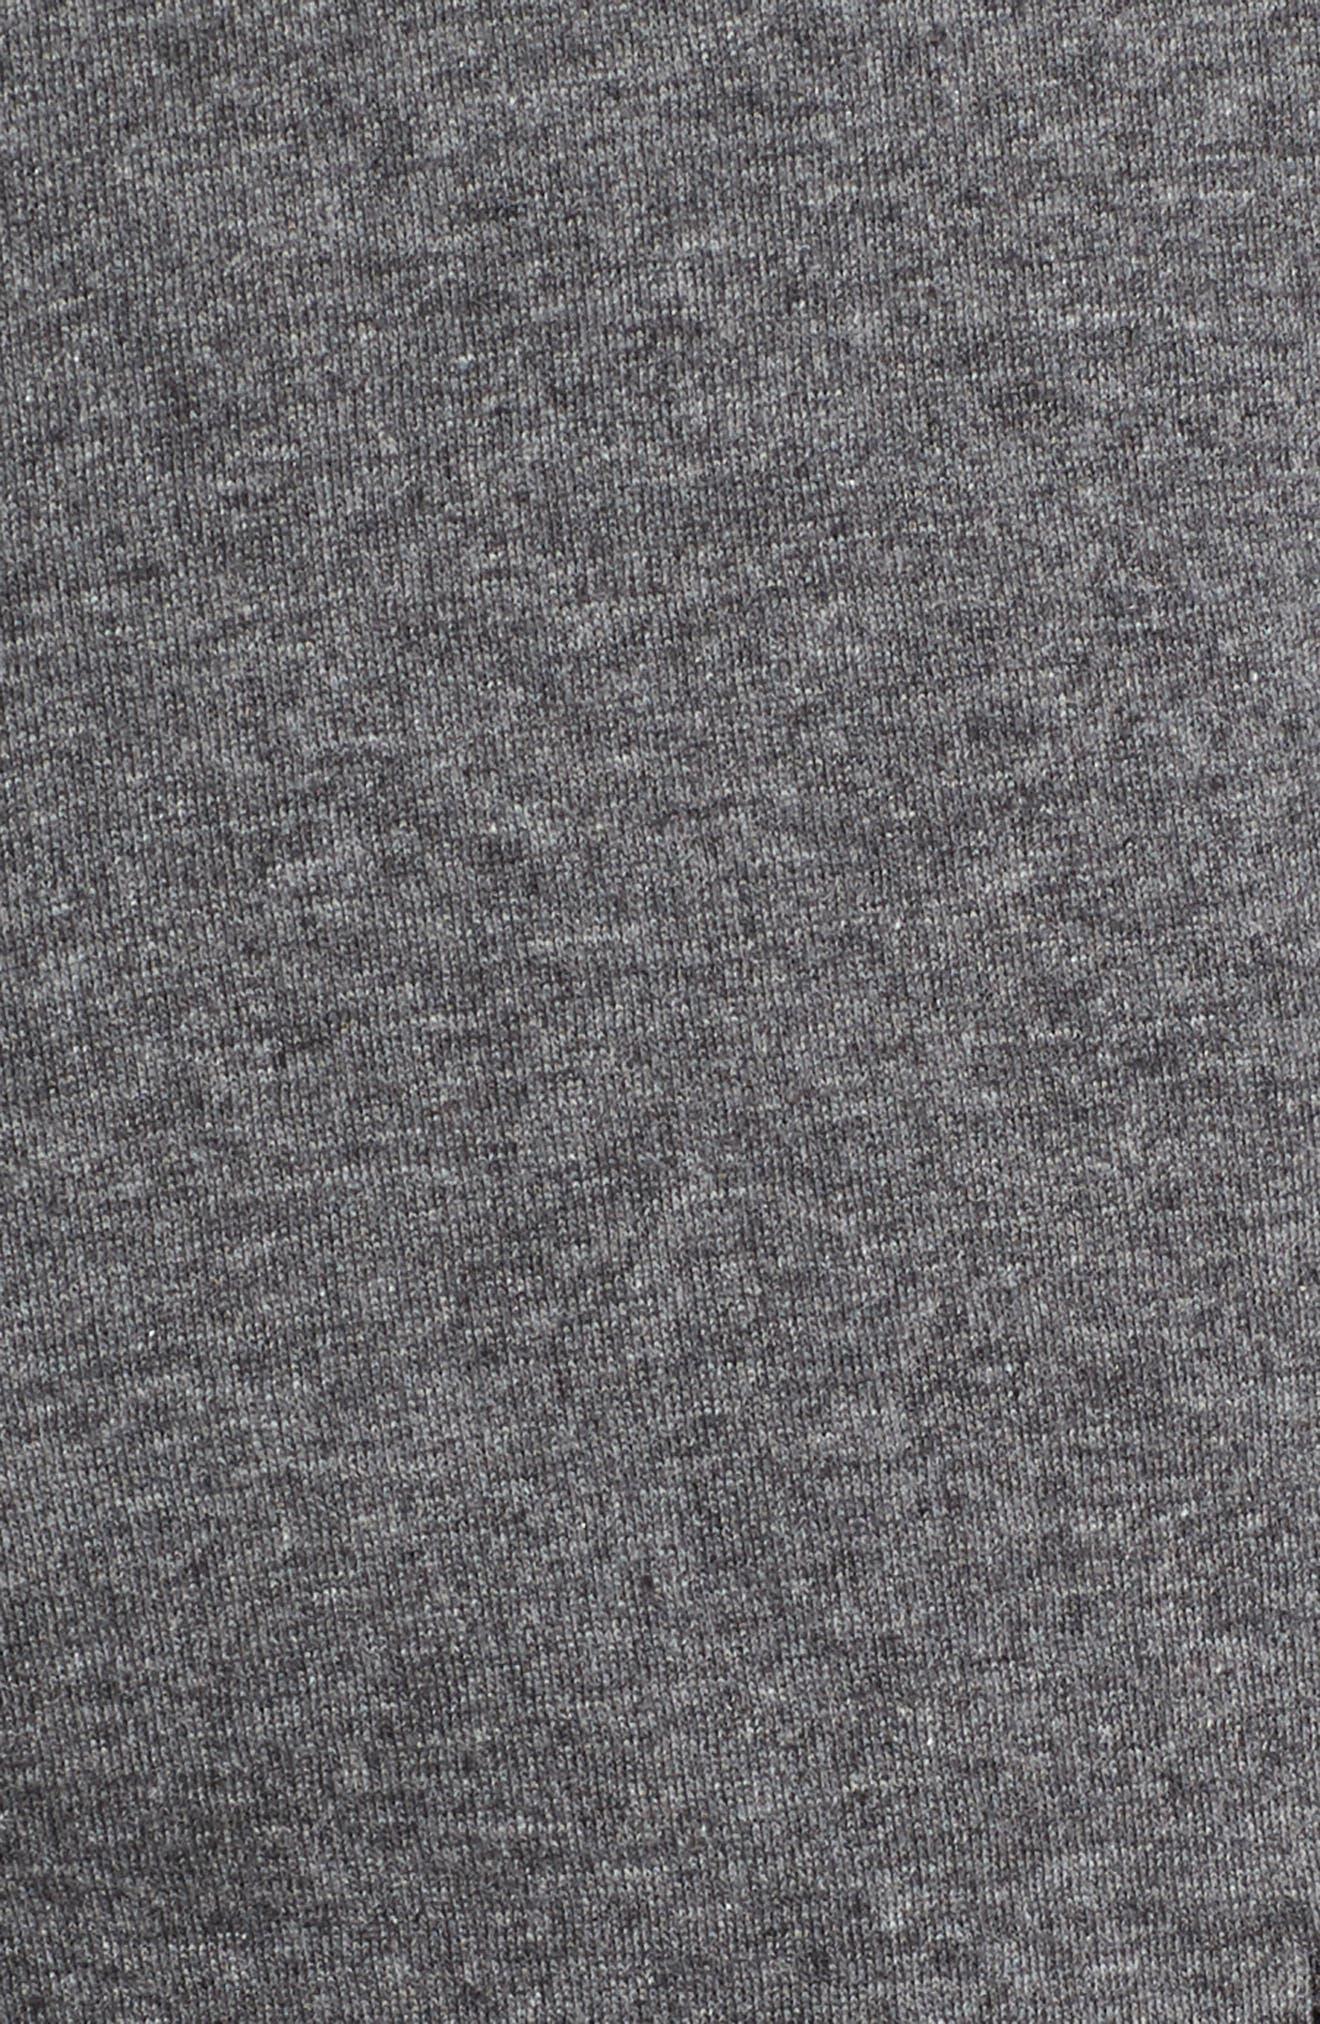 Sportswear Modern Shorts,                             Alternate thumbnail 5, color,                             Charcoal Heather/ Black